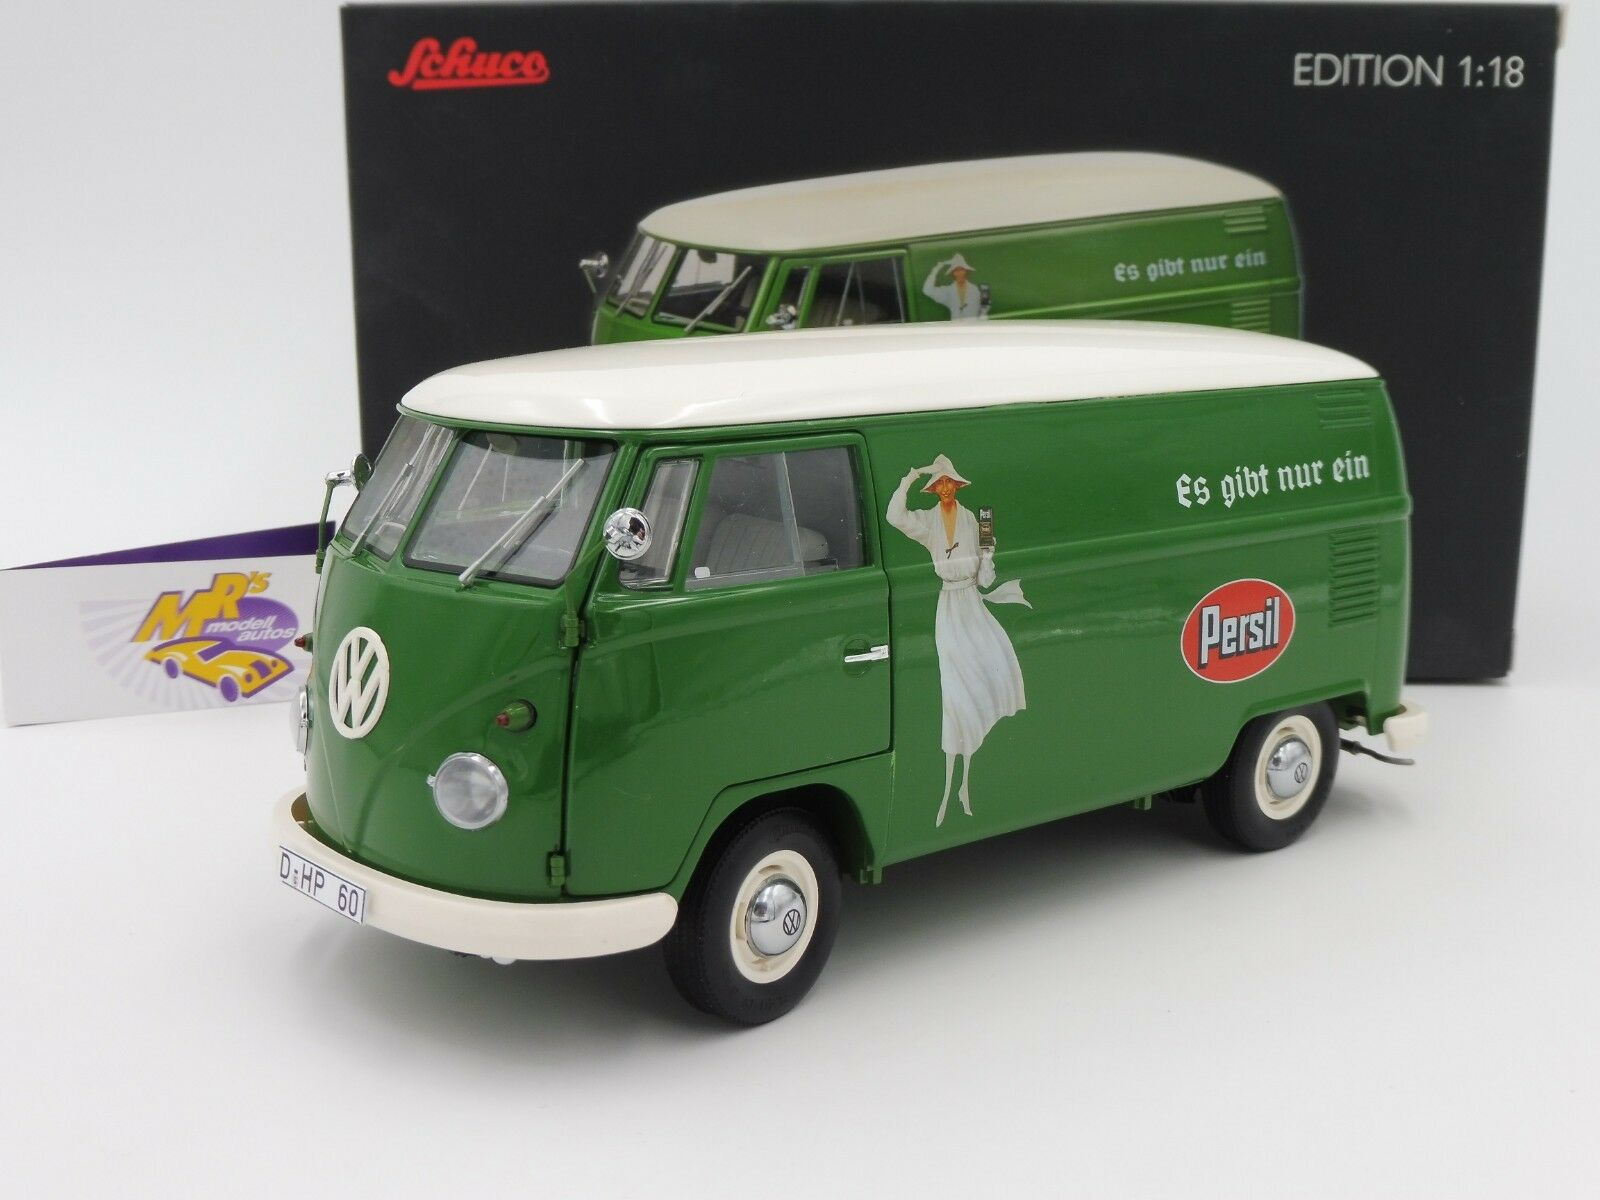 Schuco 00366   VOLKSWAGEN VW t1 Transporter anno 59-63 verde-BIANCO  PERSIL  1 18